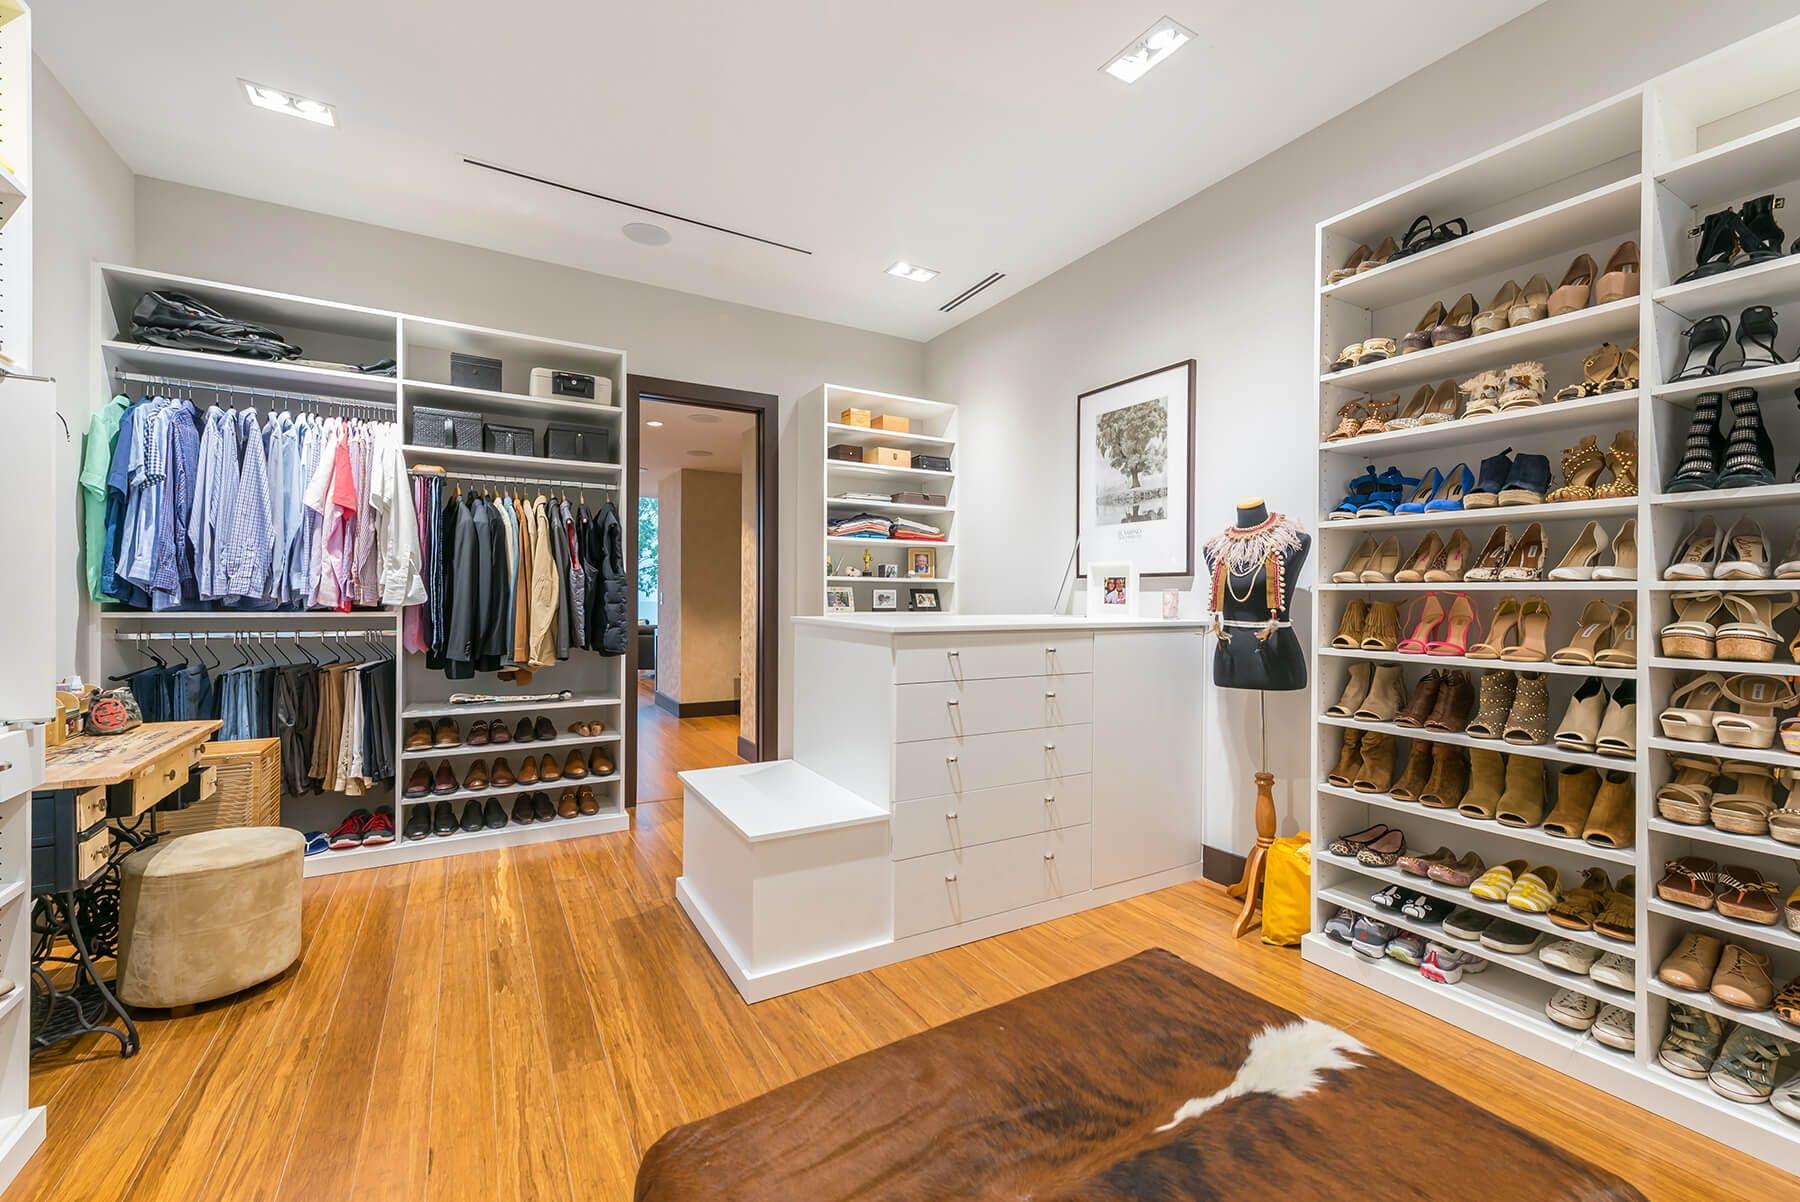 Bedroom Closet Urned Into Dressing Room